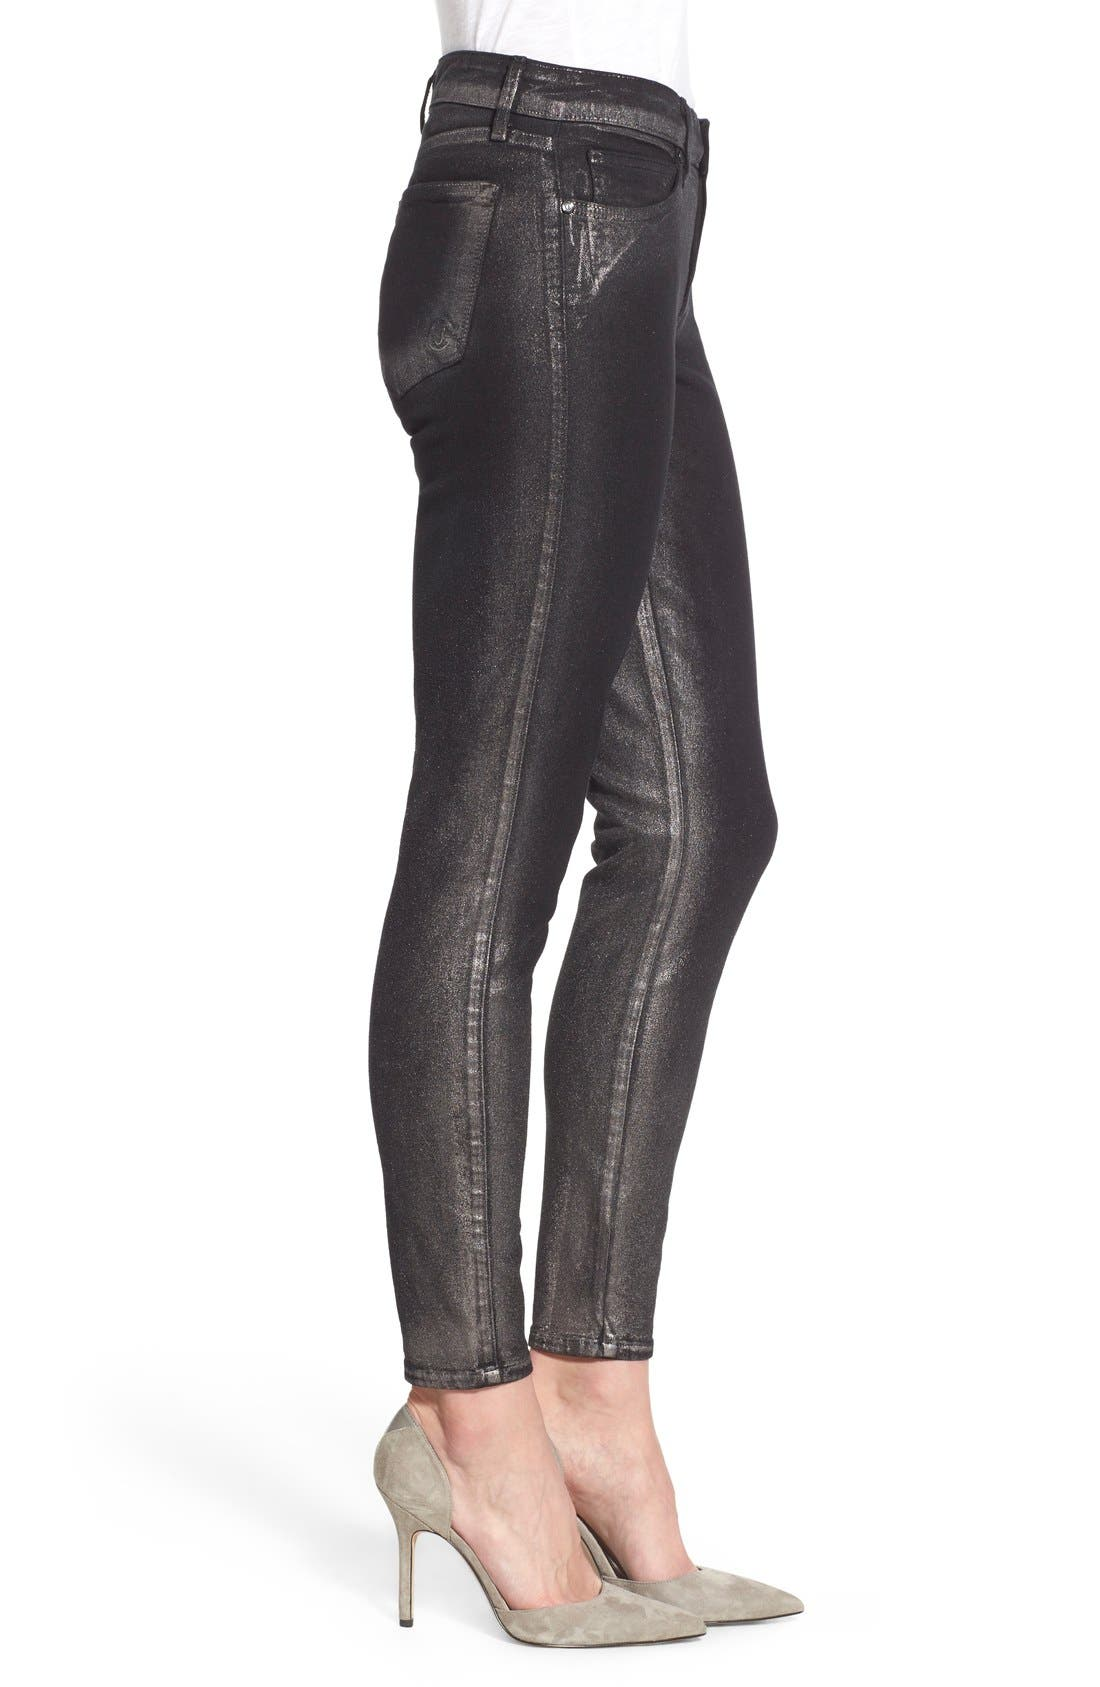 Alternate Image 3  - CJ by Cookie Johnson 'Wisdom' Brushed Foil Skinny Jeans (Pewter)